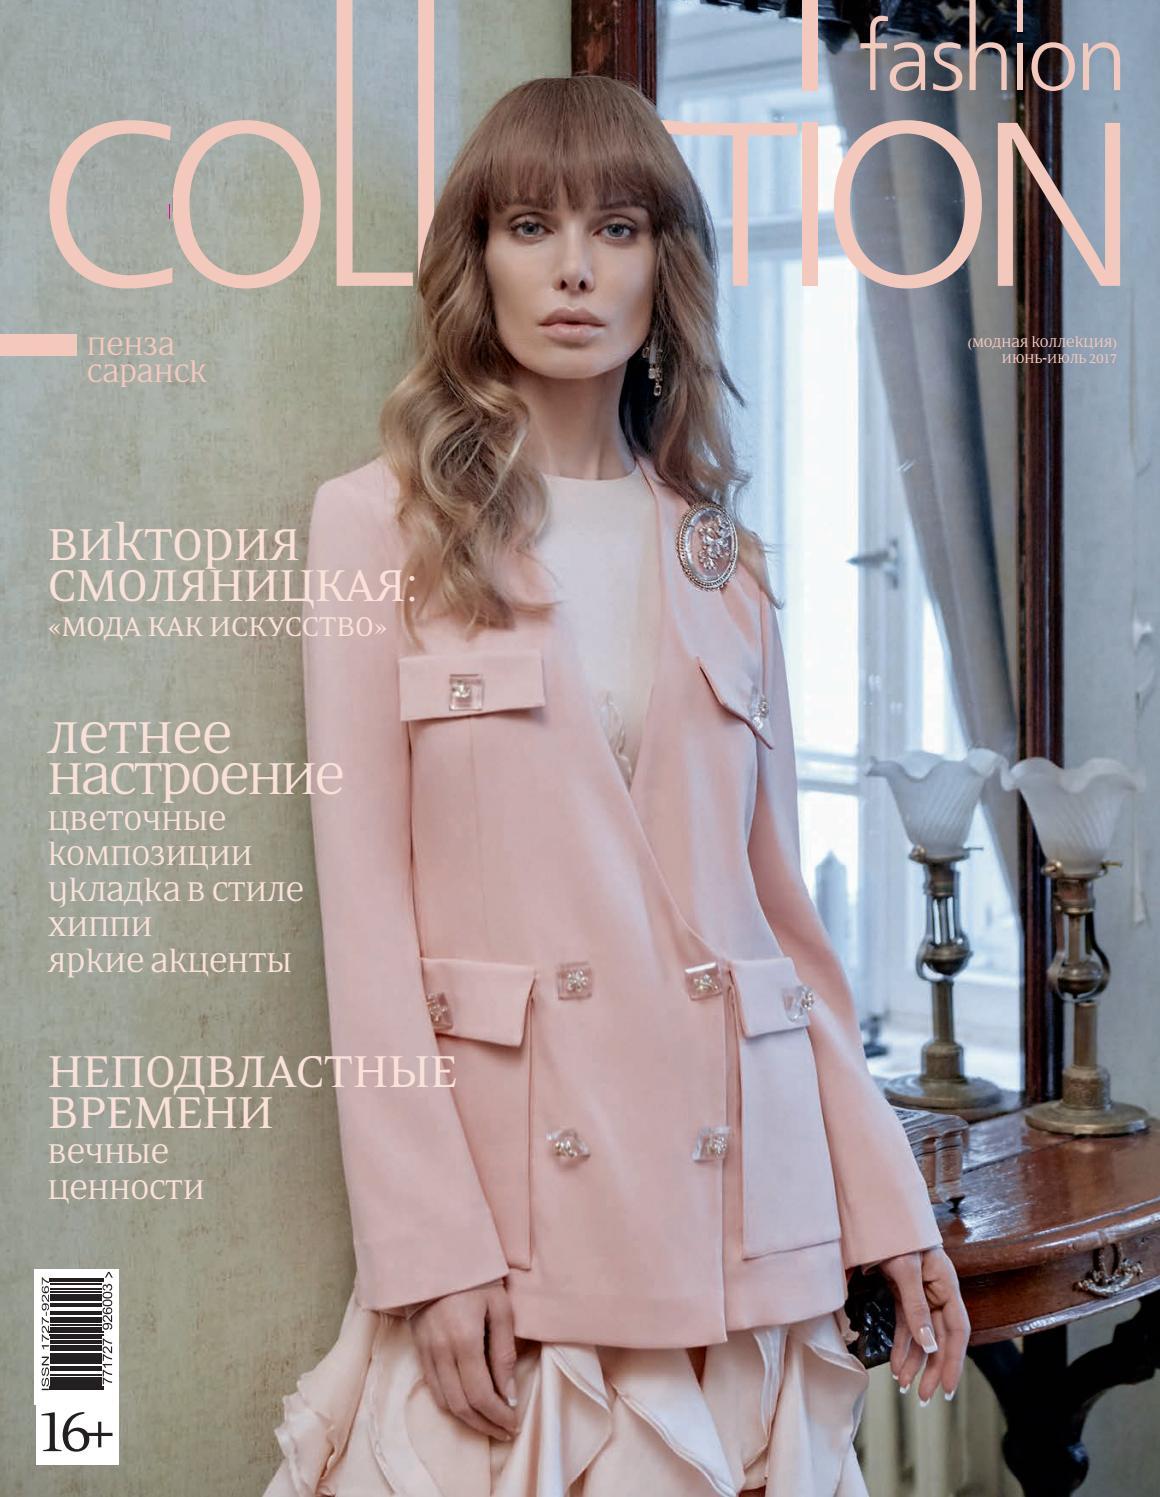 cdf90481075 Fashion Collection Penza Juni  Juli 2017 by Fashion Collection Пенза - issuu